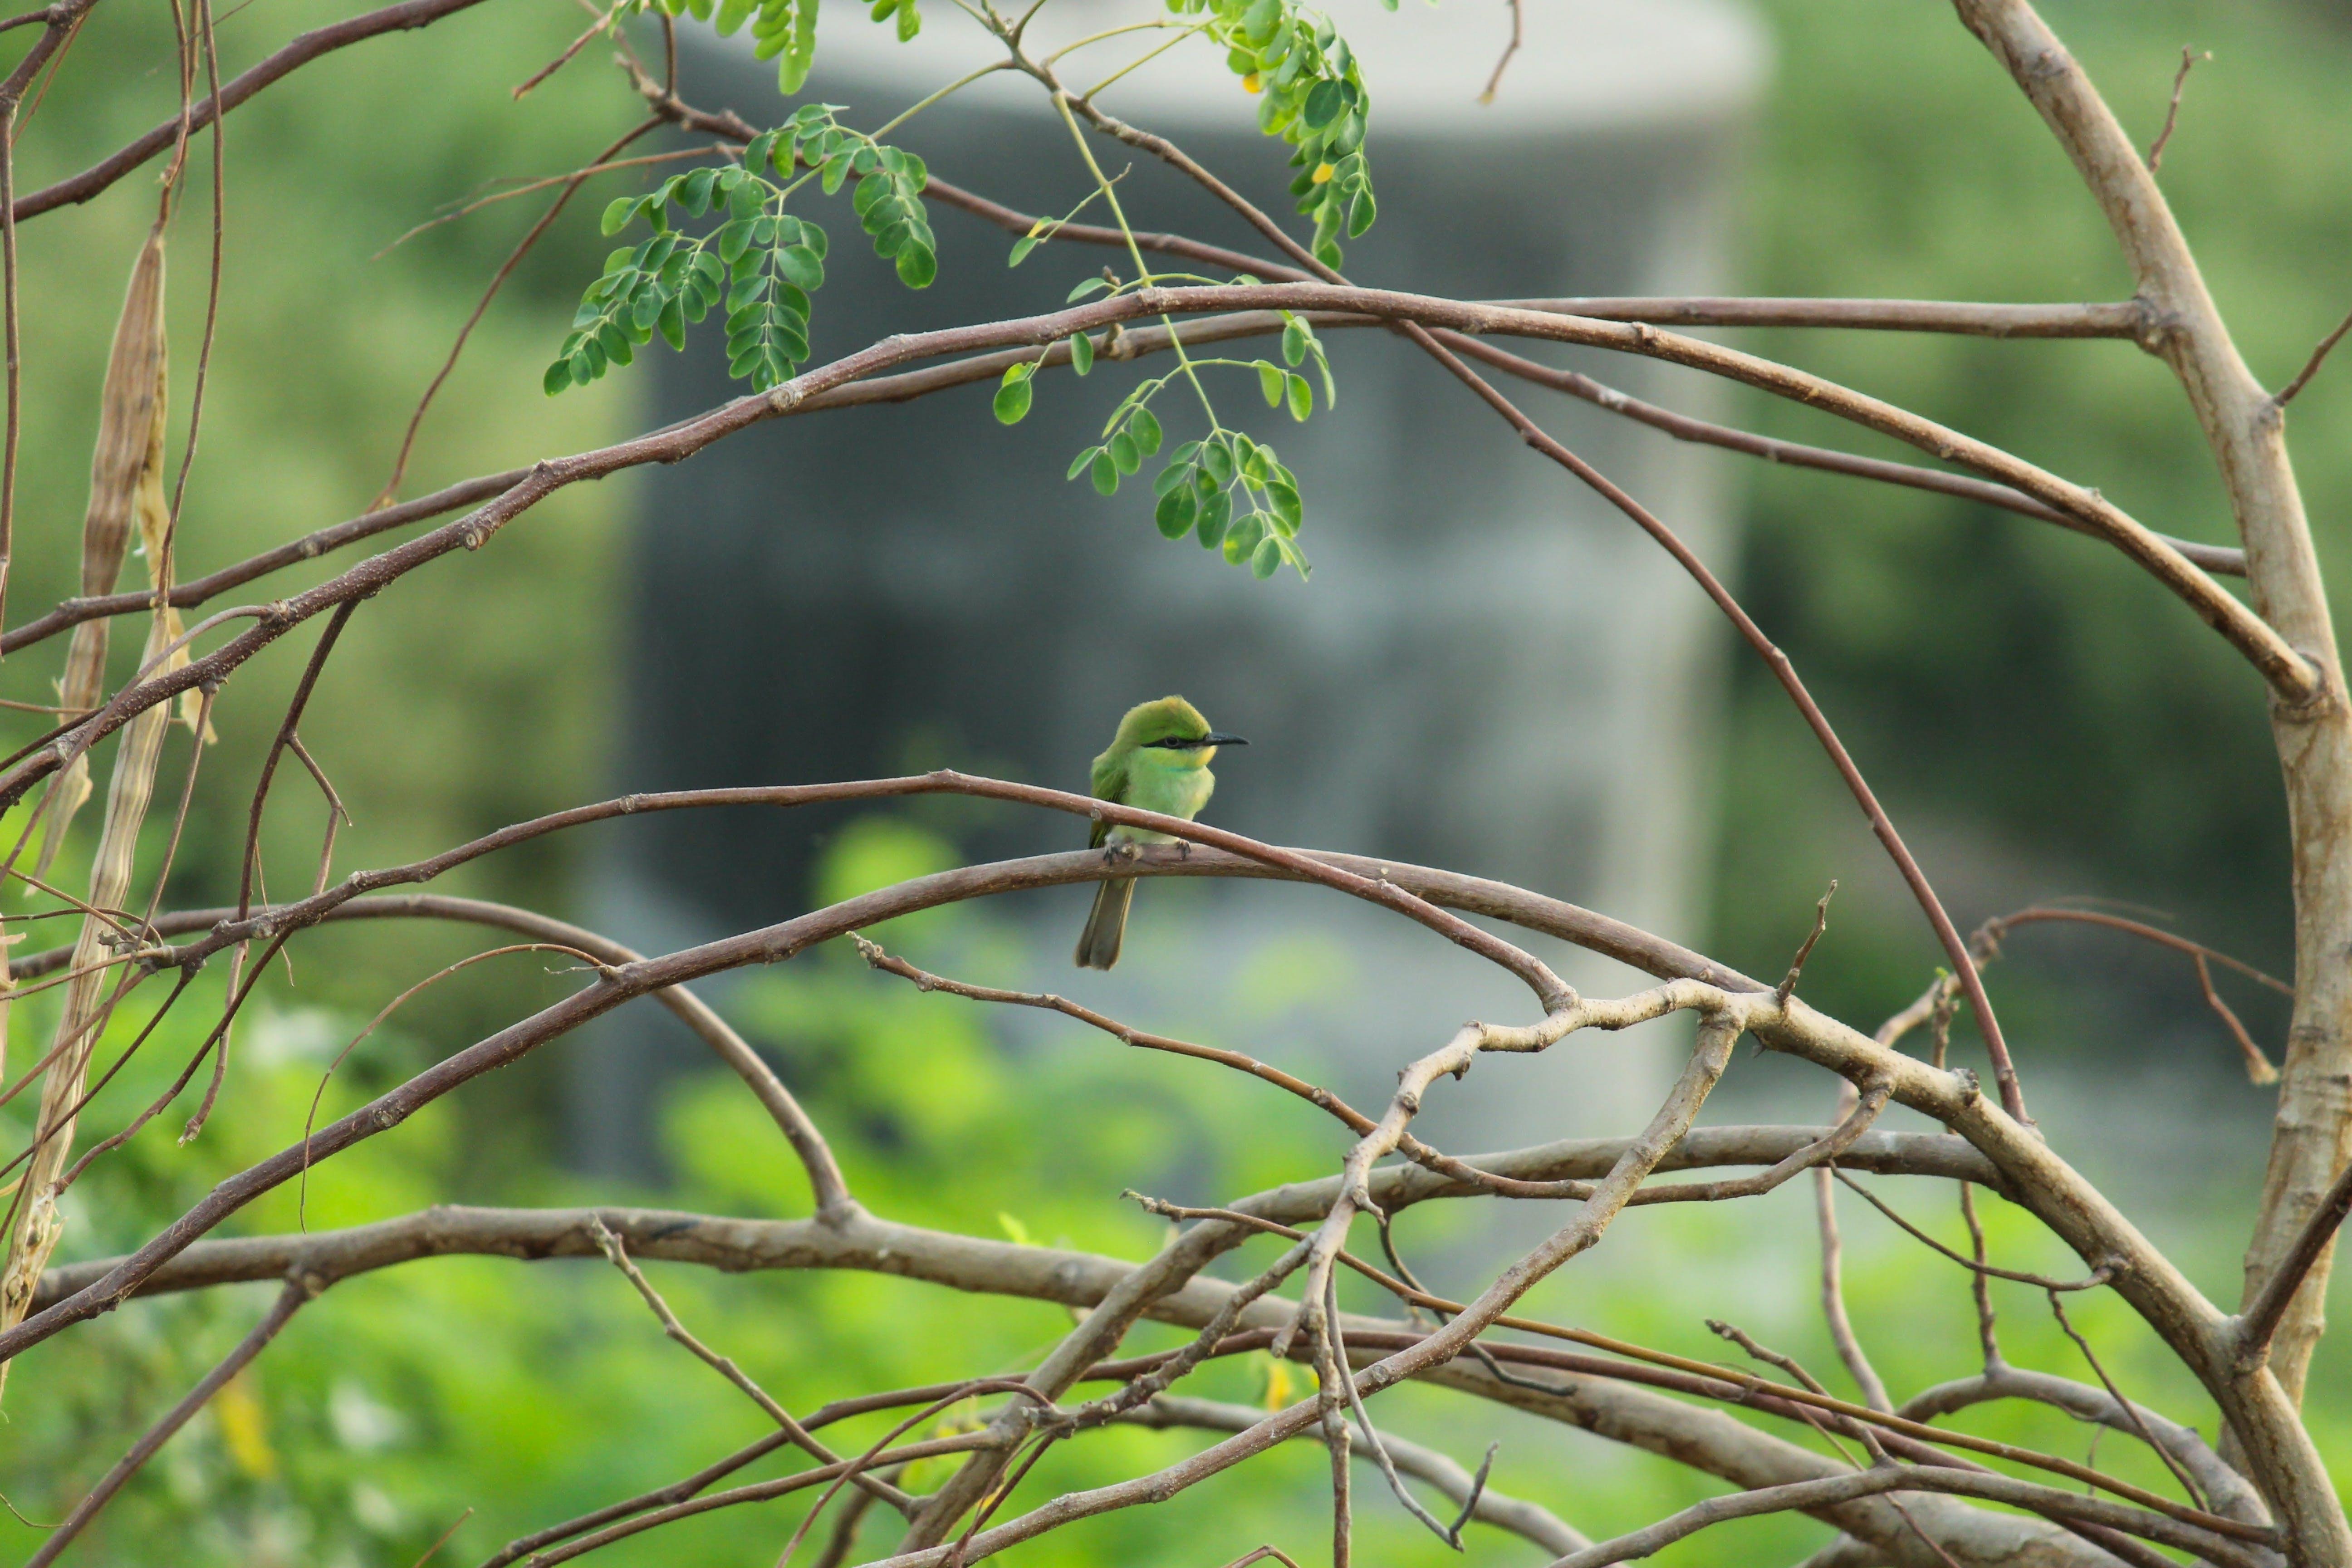 Foto d'estoc gratuïta de #beeeater #birds #bird #nature #birdwatching #bird, #greenbeeeater #sunshine #tree #beauty, #light #protectnature #cutepins #wildlifepin #anim